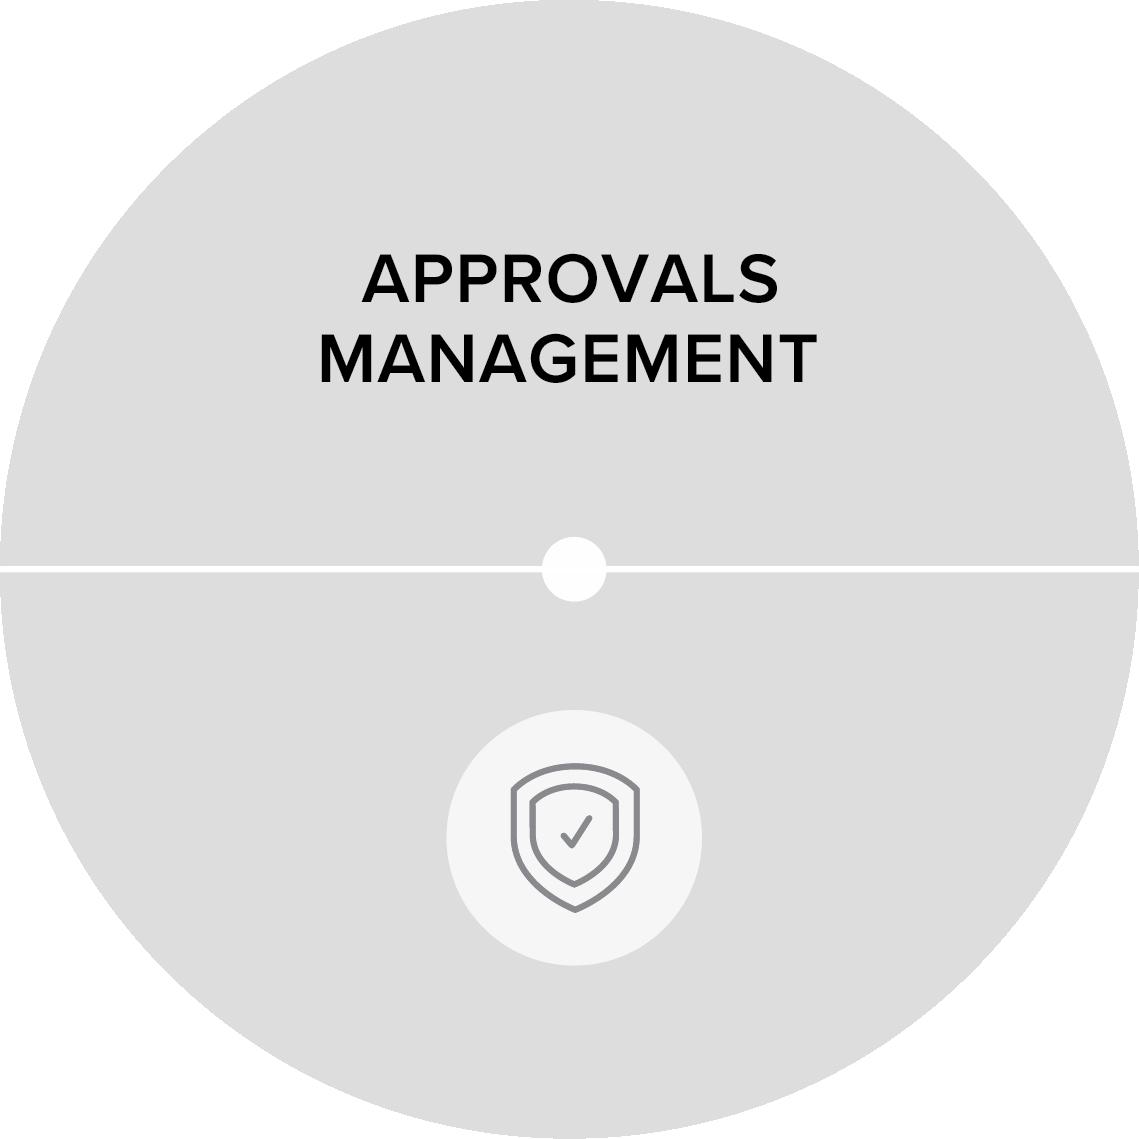 KDC_Approvals Management.png